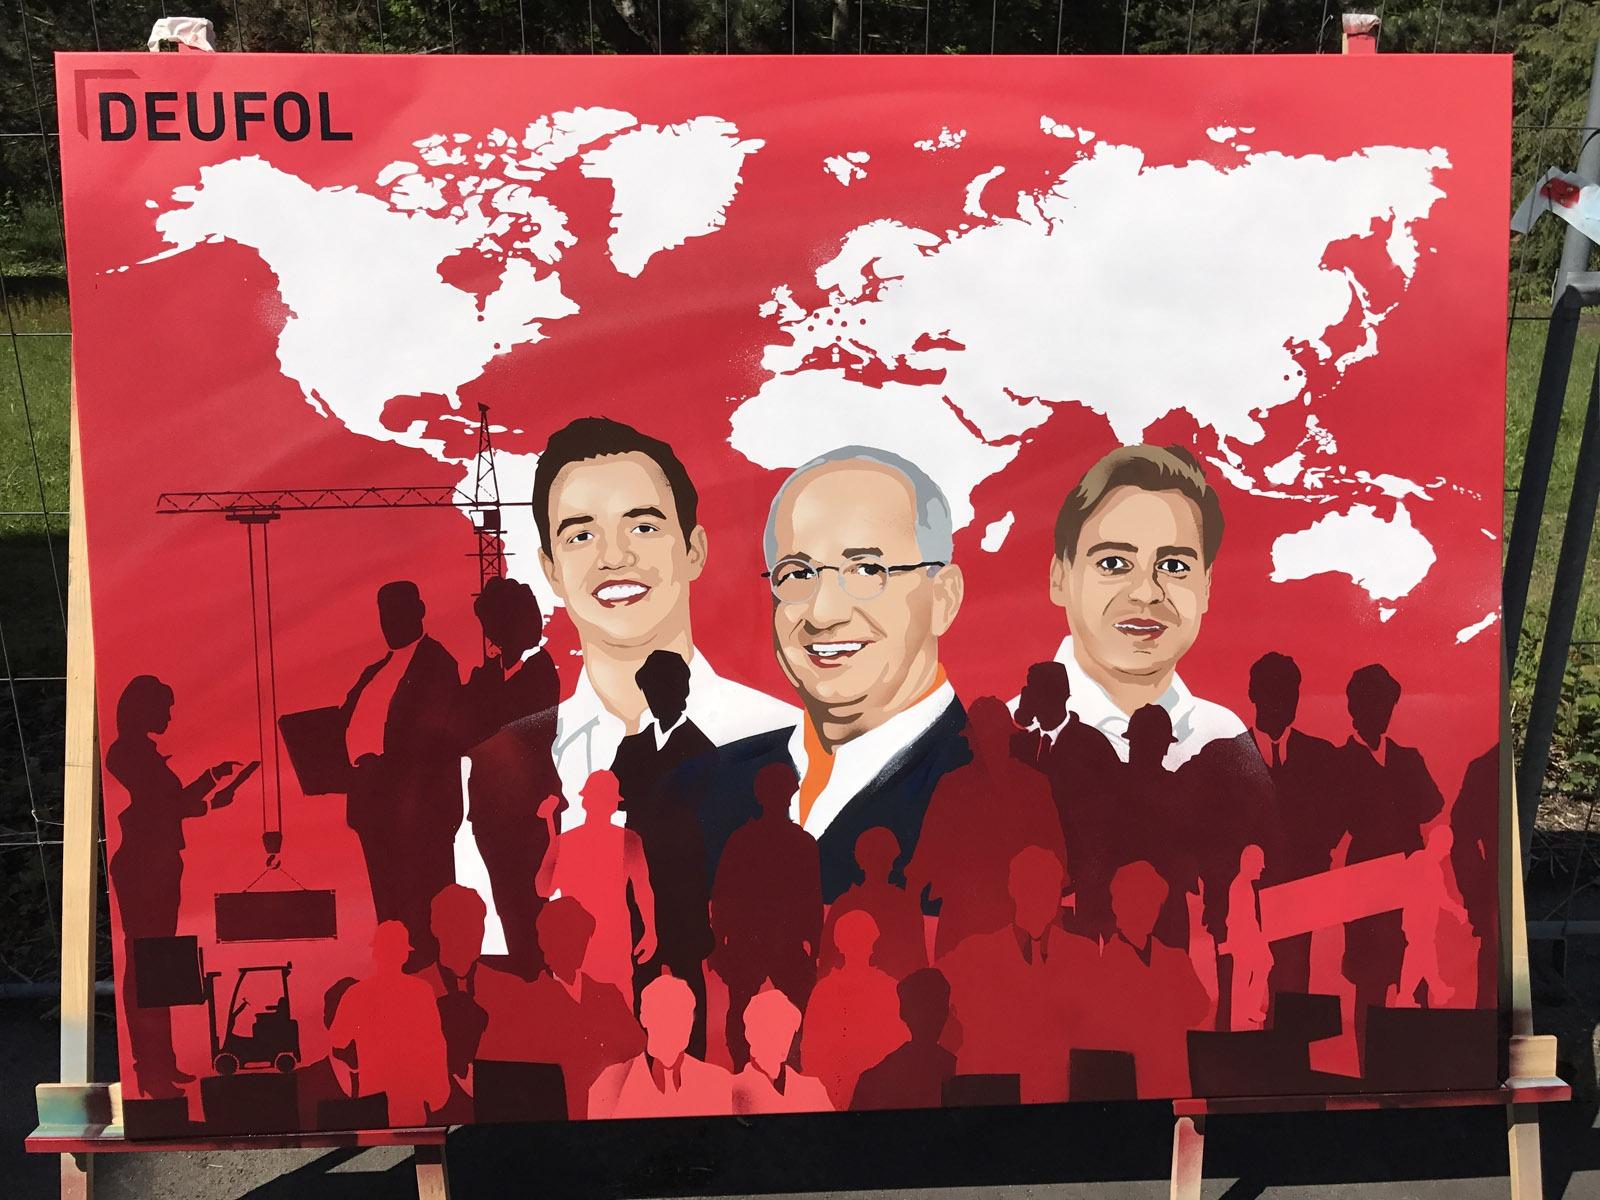 graffitiauftrag-graffitikuenstler-artmos4-deufol-leinwand-rot-menschen-silhouetten-maschine-karte-planet-illustrativ